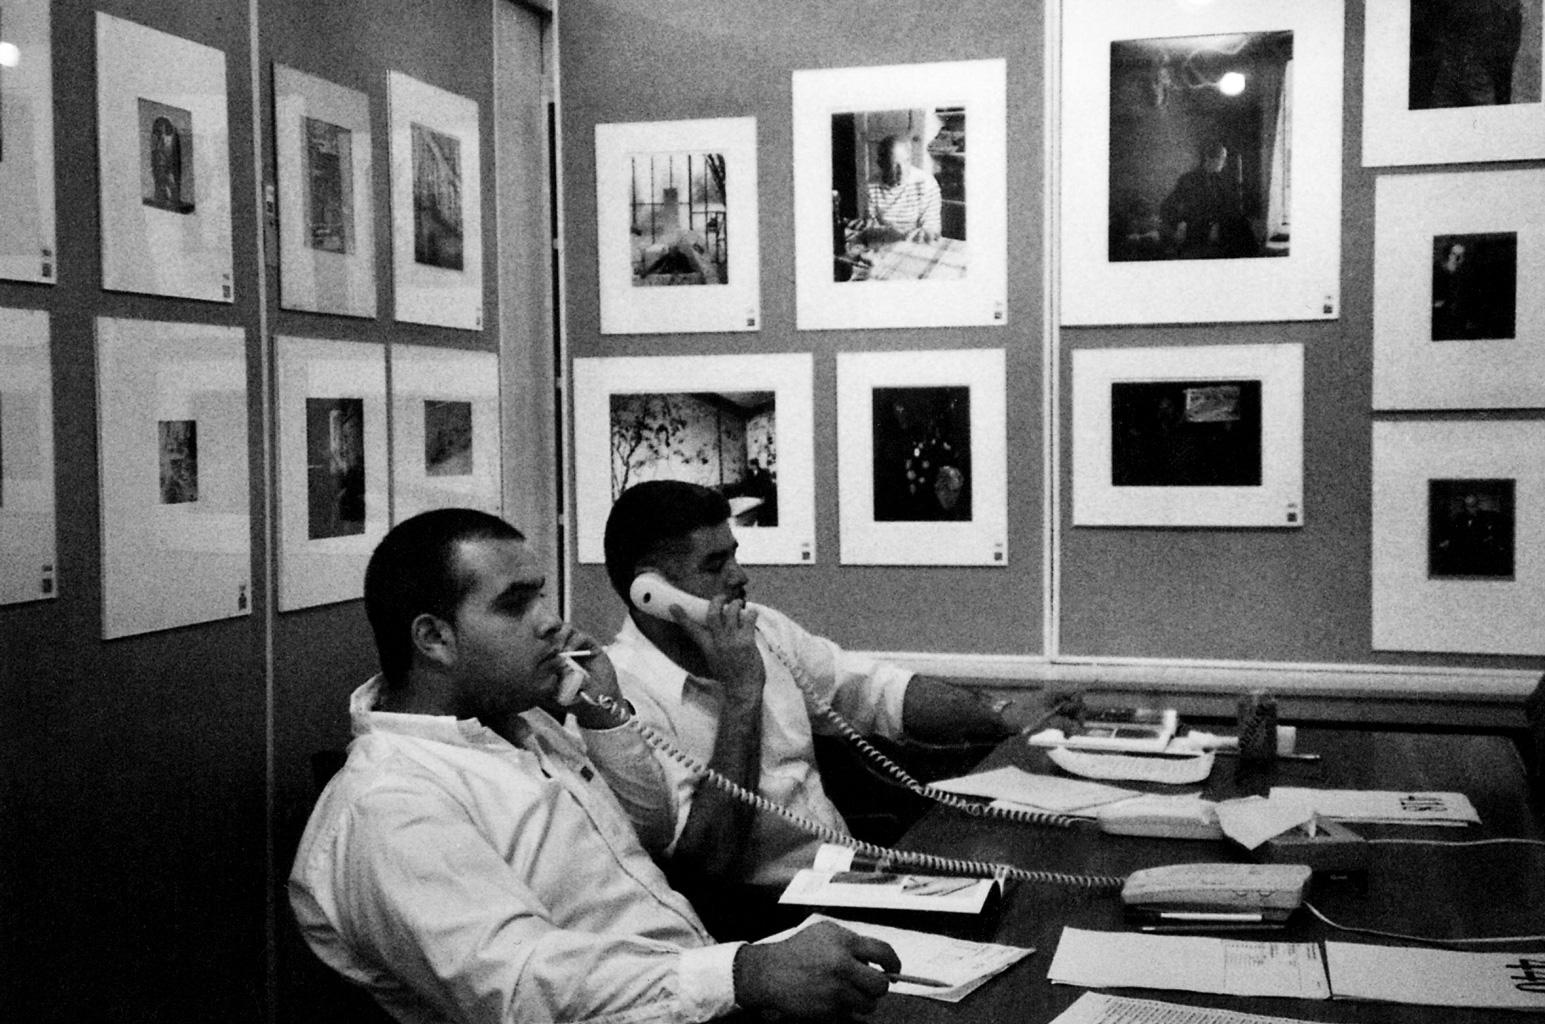 David Rivera & Carlos Ortiz, circa 2007